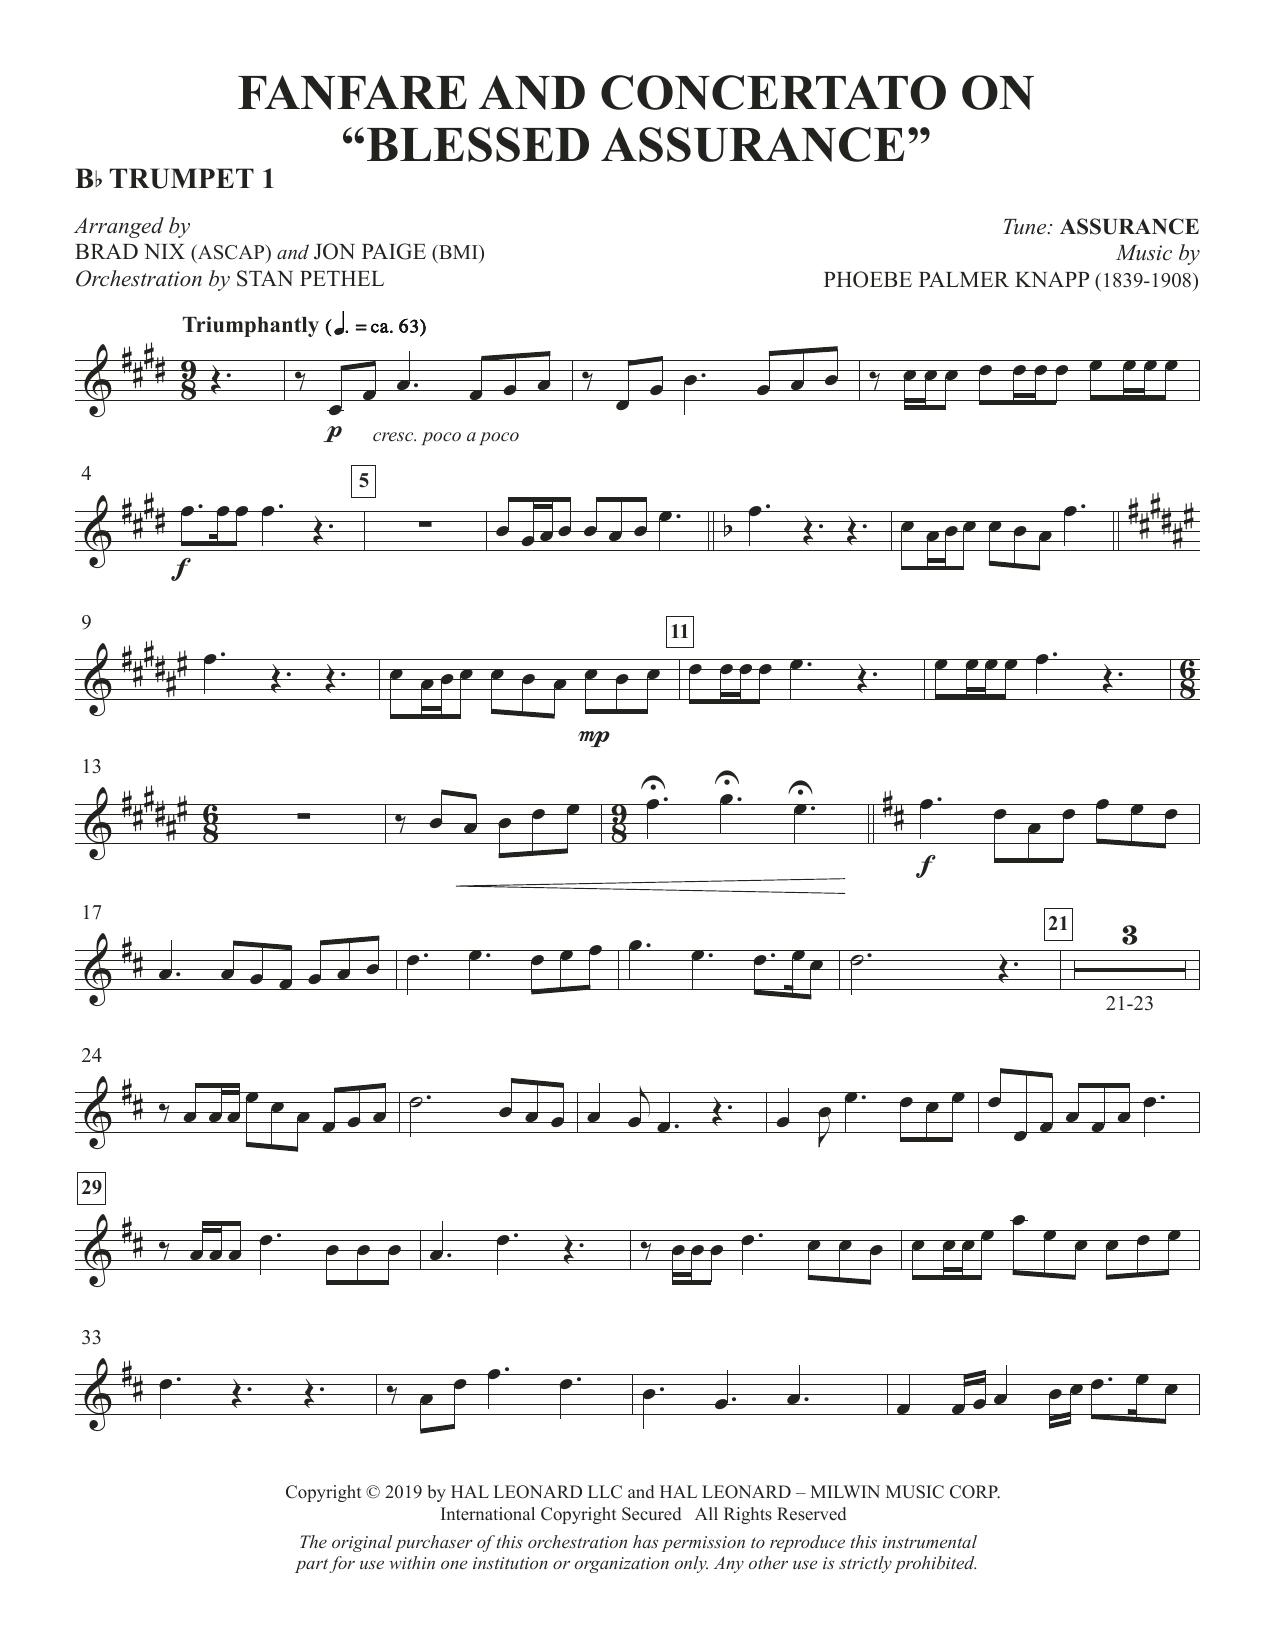 "Fanfare and Concertato on ""Blessed Assurance"" (arr. Brad Nix & Jon Paige) - Bb Trumpet 1 Partituras Digitales"